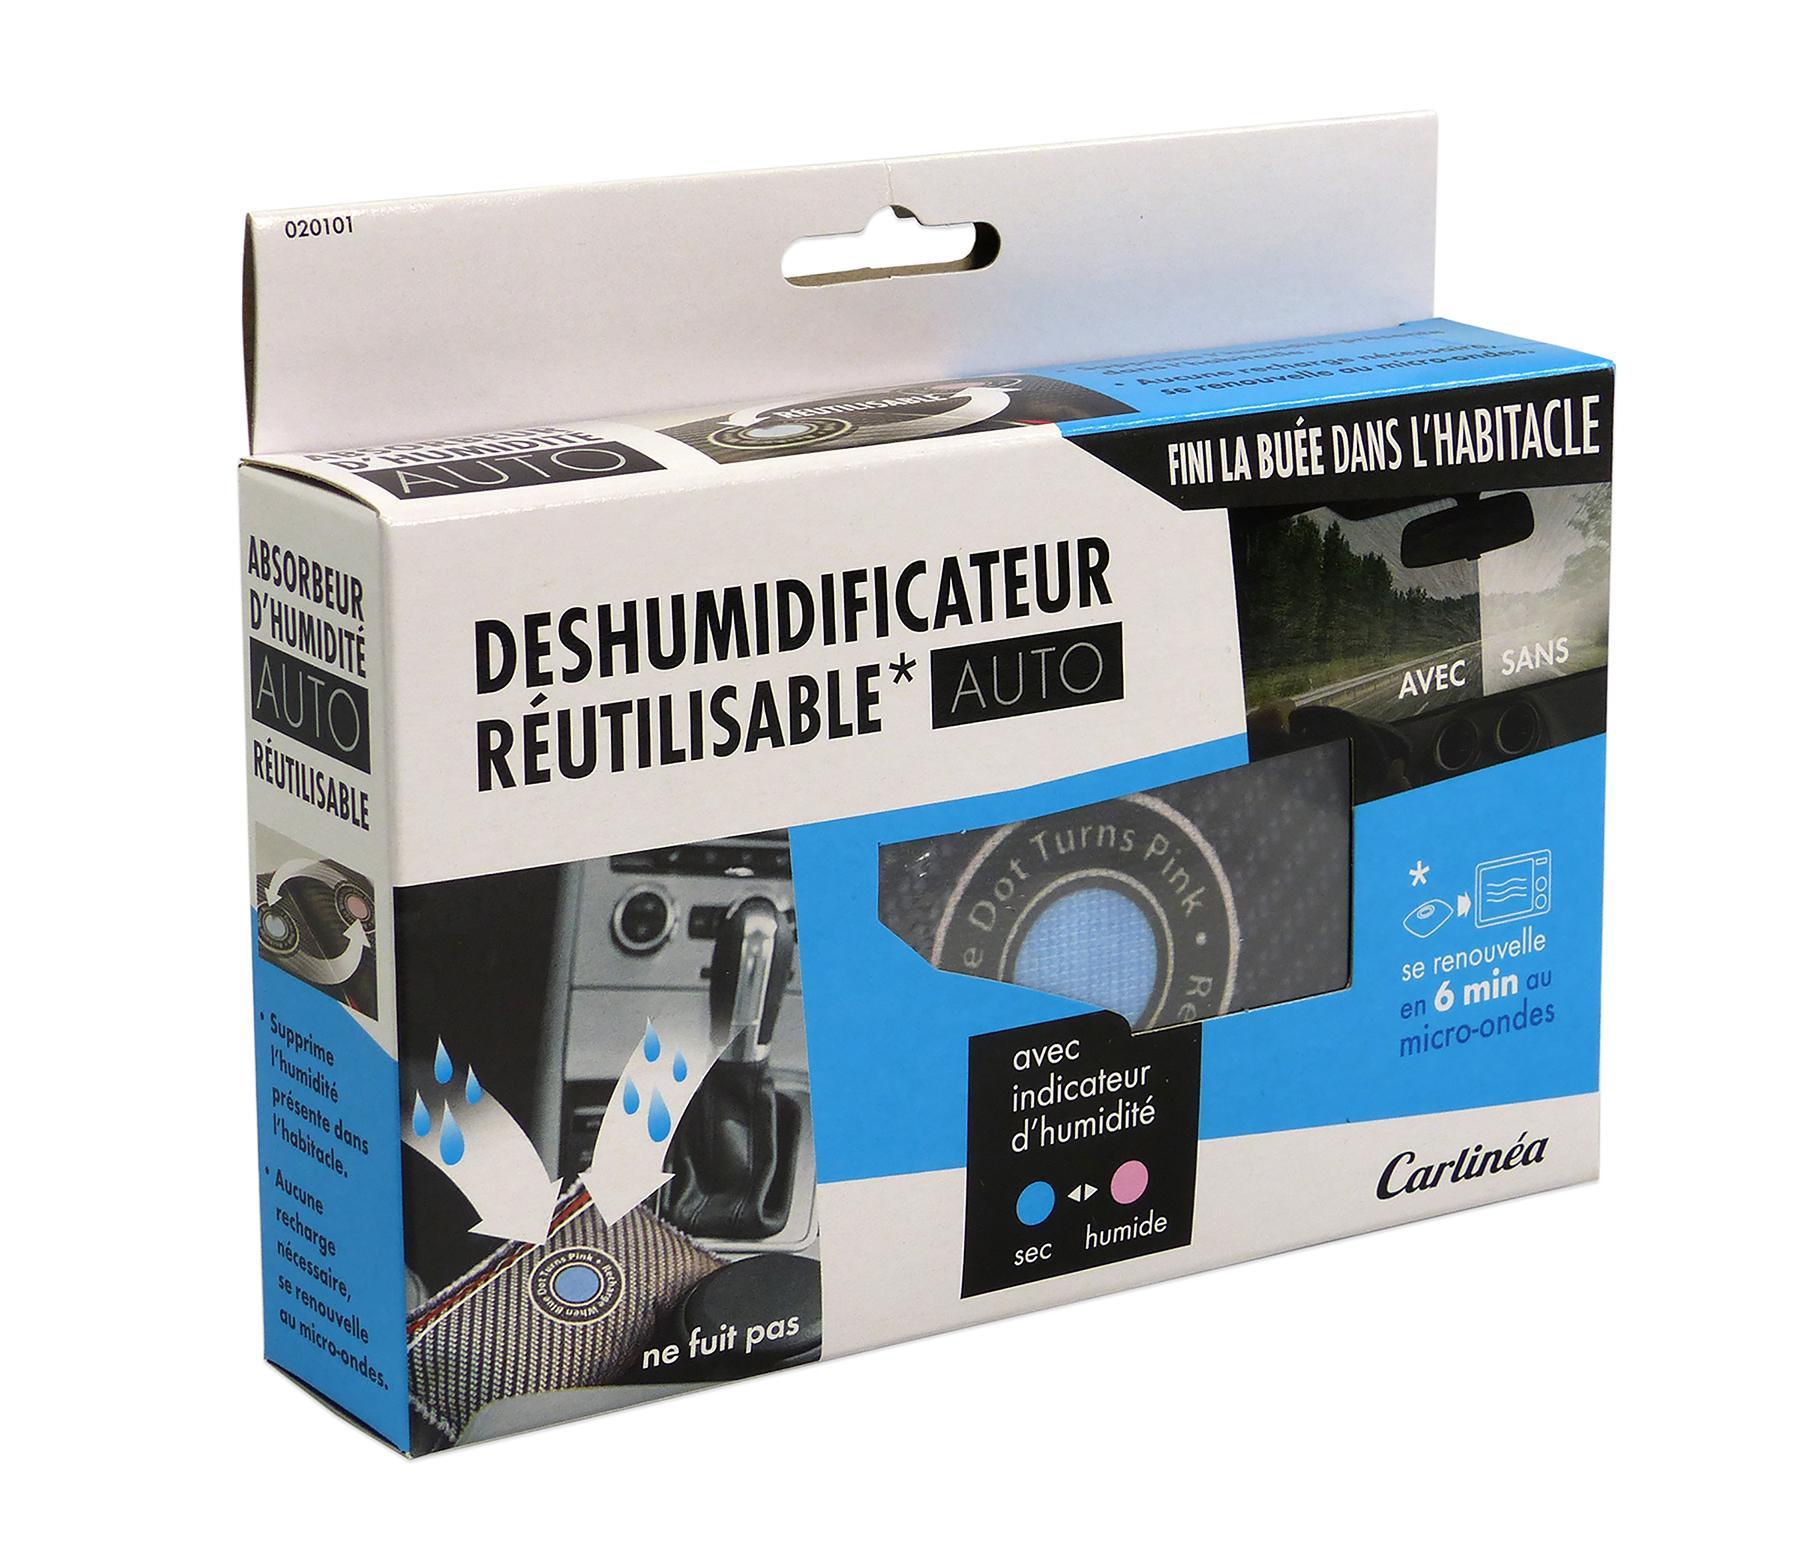 Car dehumidifier Carlinea 020101 rating